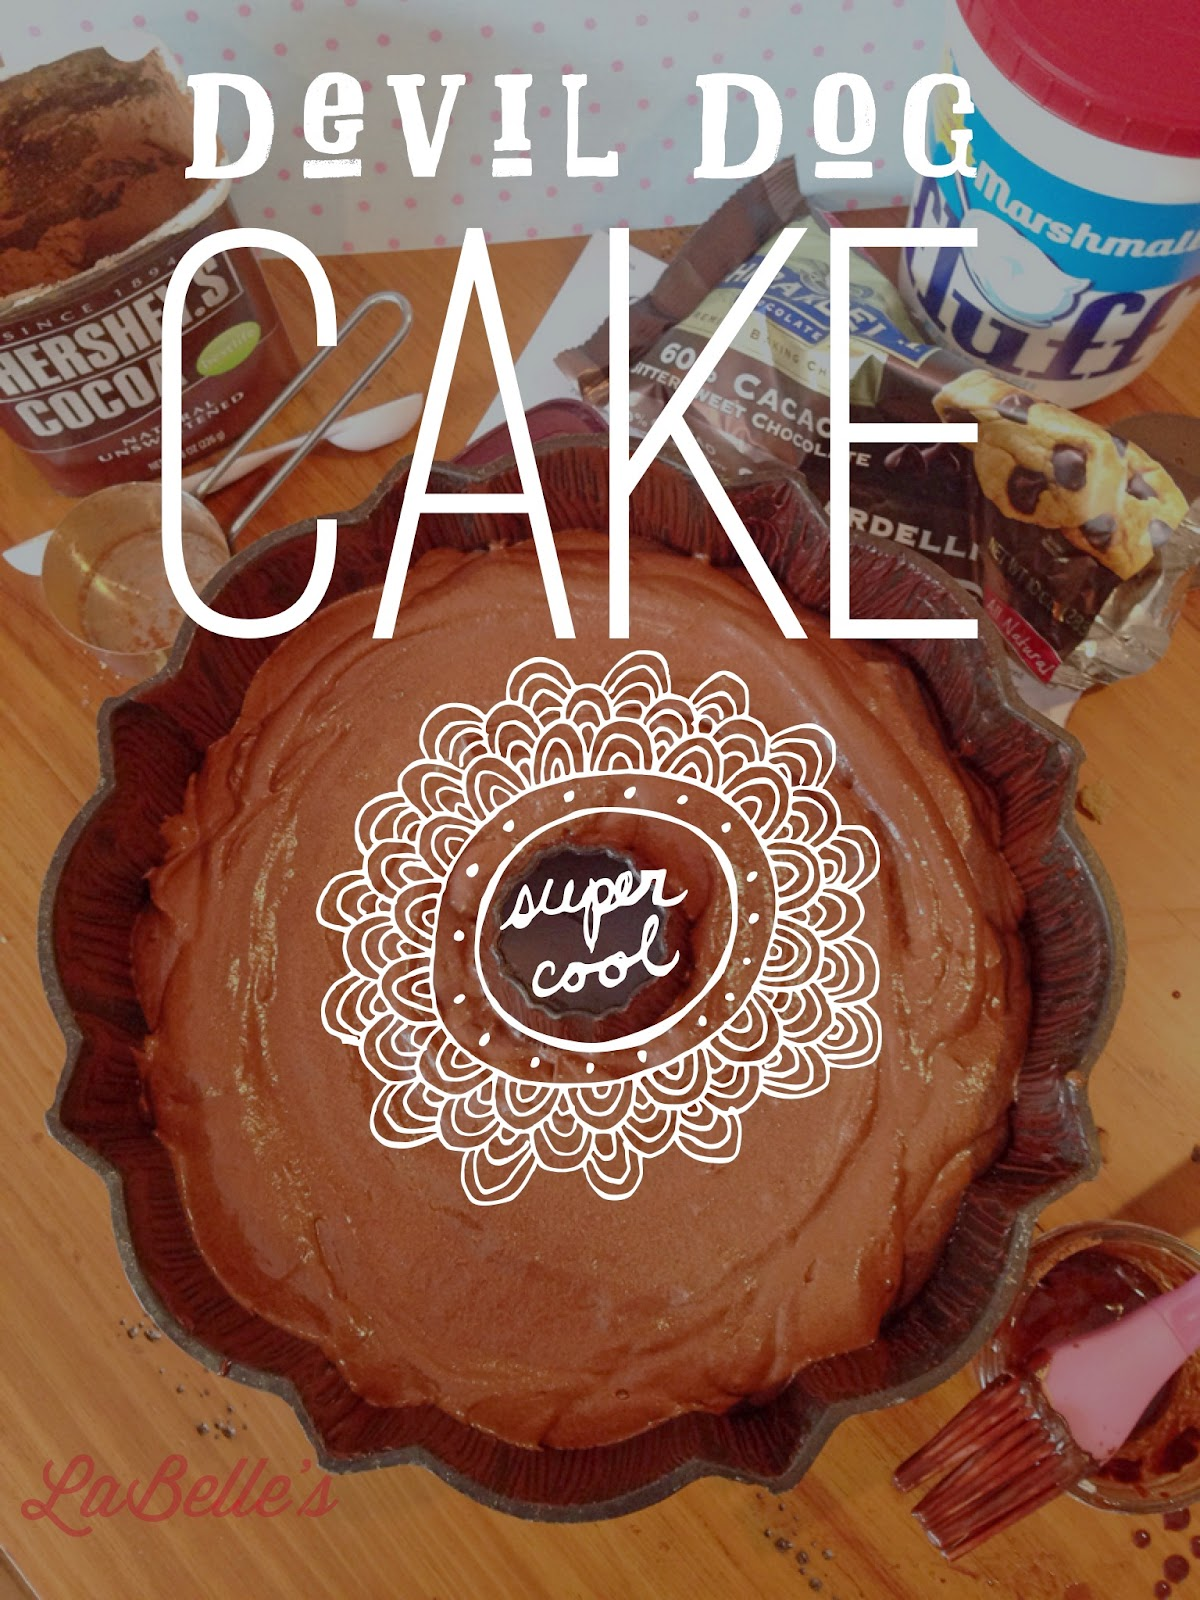 LaBelle's Devil Dog Cake   Yum!